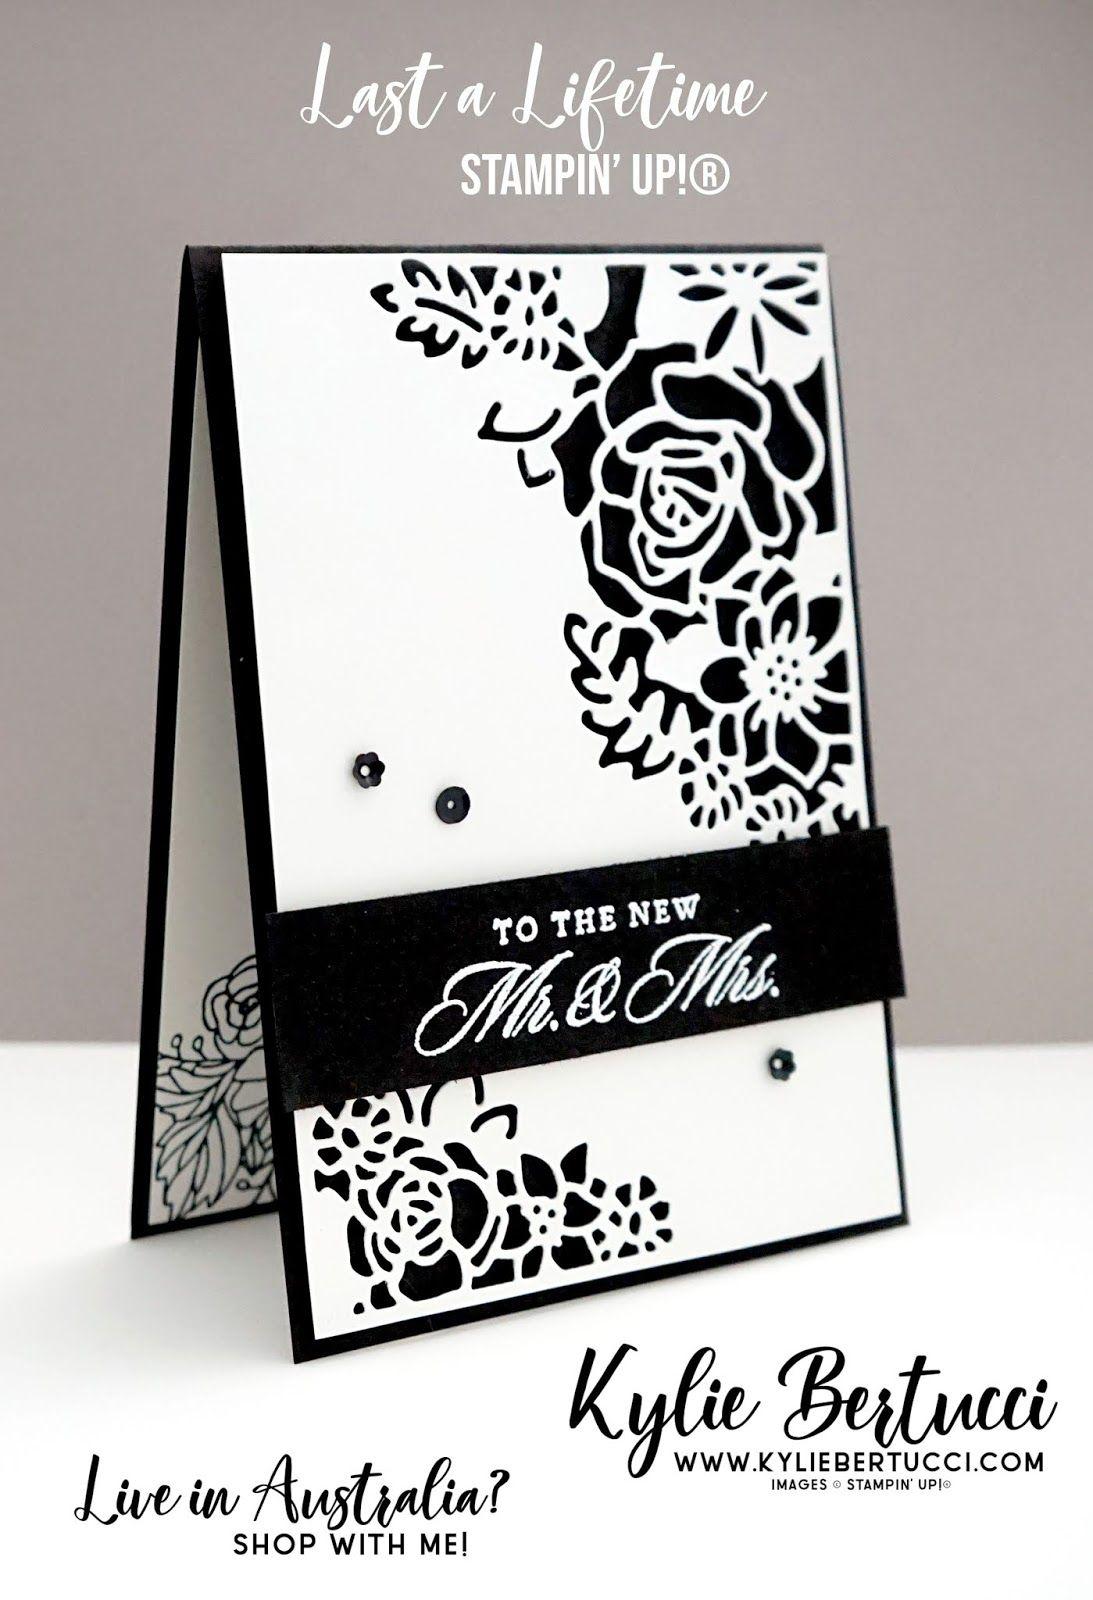 Last A Lifetime Bundle Kylie Bertucci Stampin Up Australia Stampinup Cardmaking Handmadecard Ru Stampin Up Wedding Cards Cards Wedding Cards Handmade